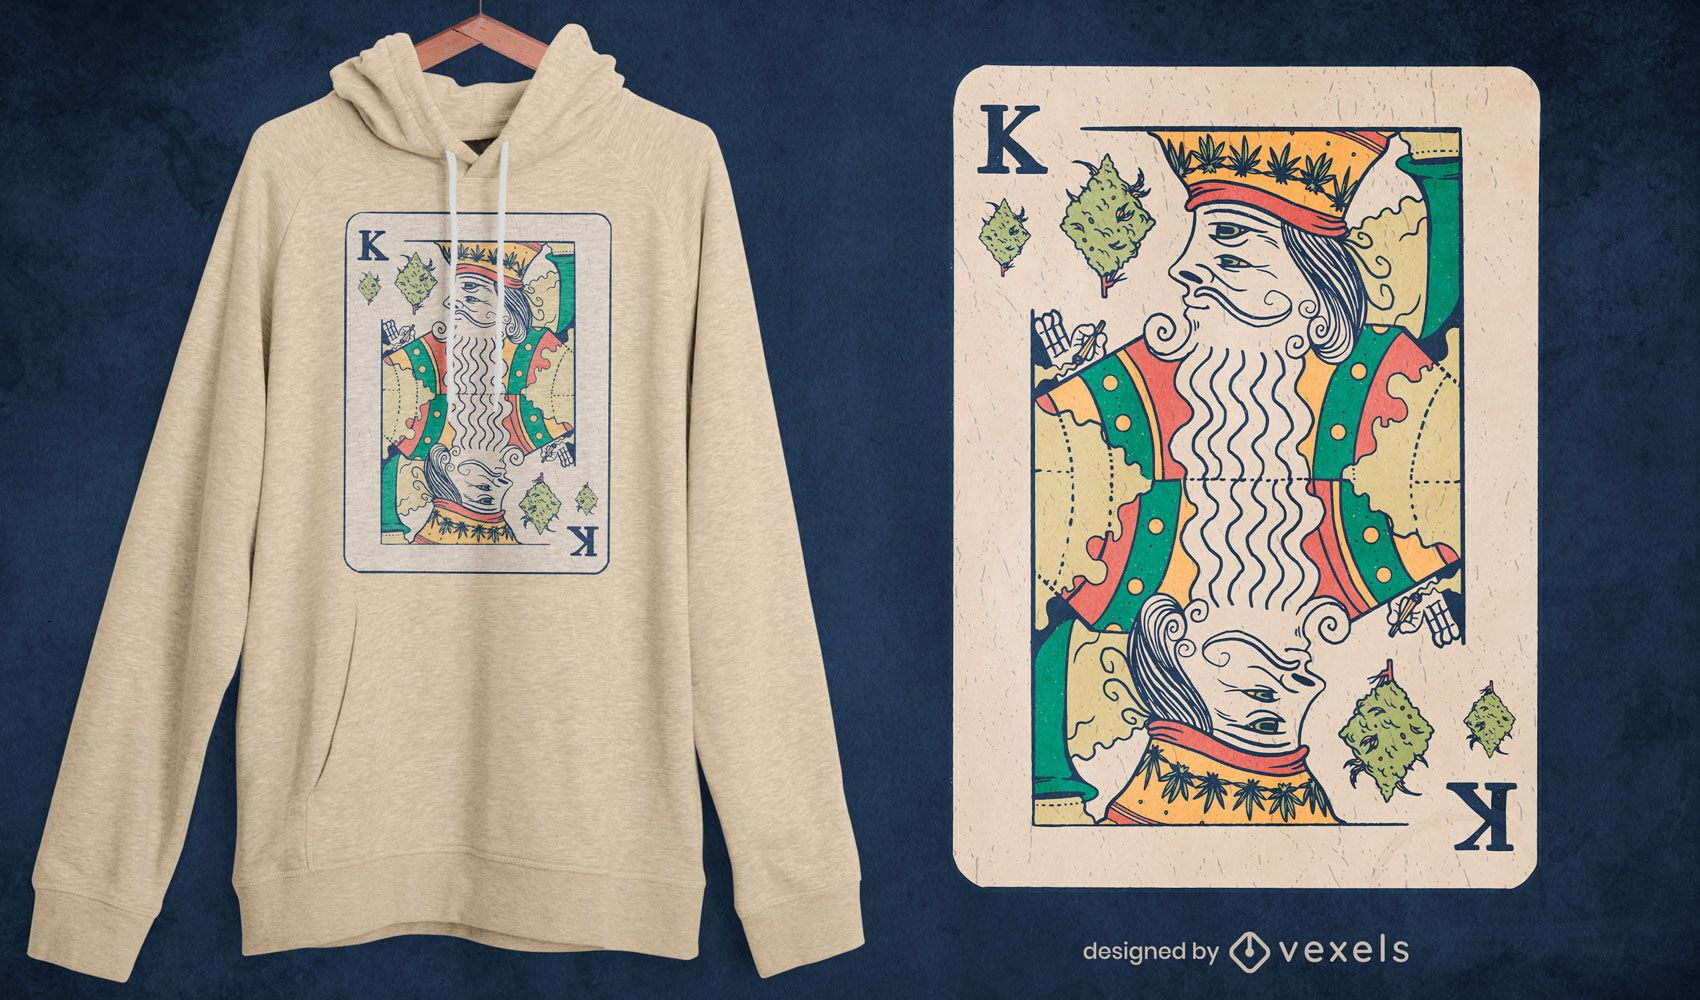 König Poker Karte Unkraut T-Shirt Design